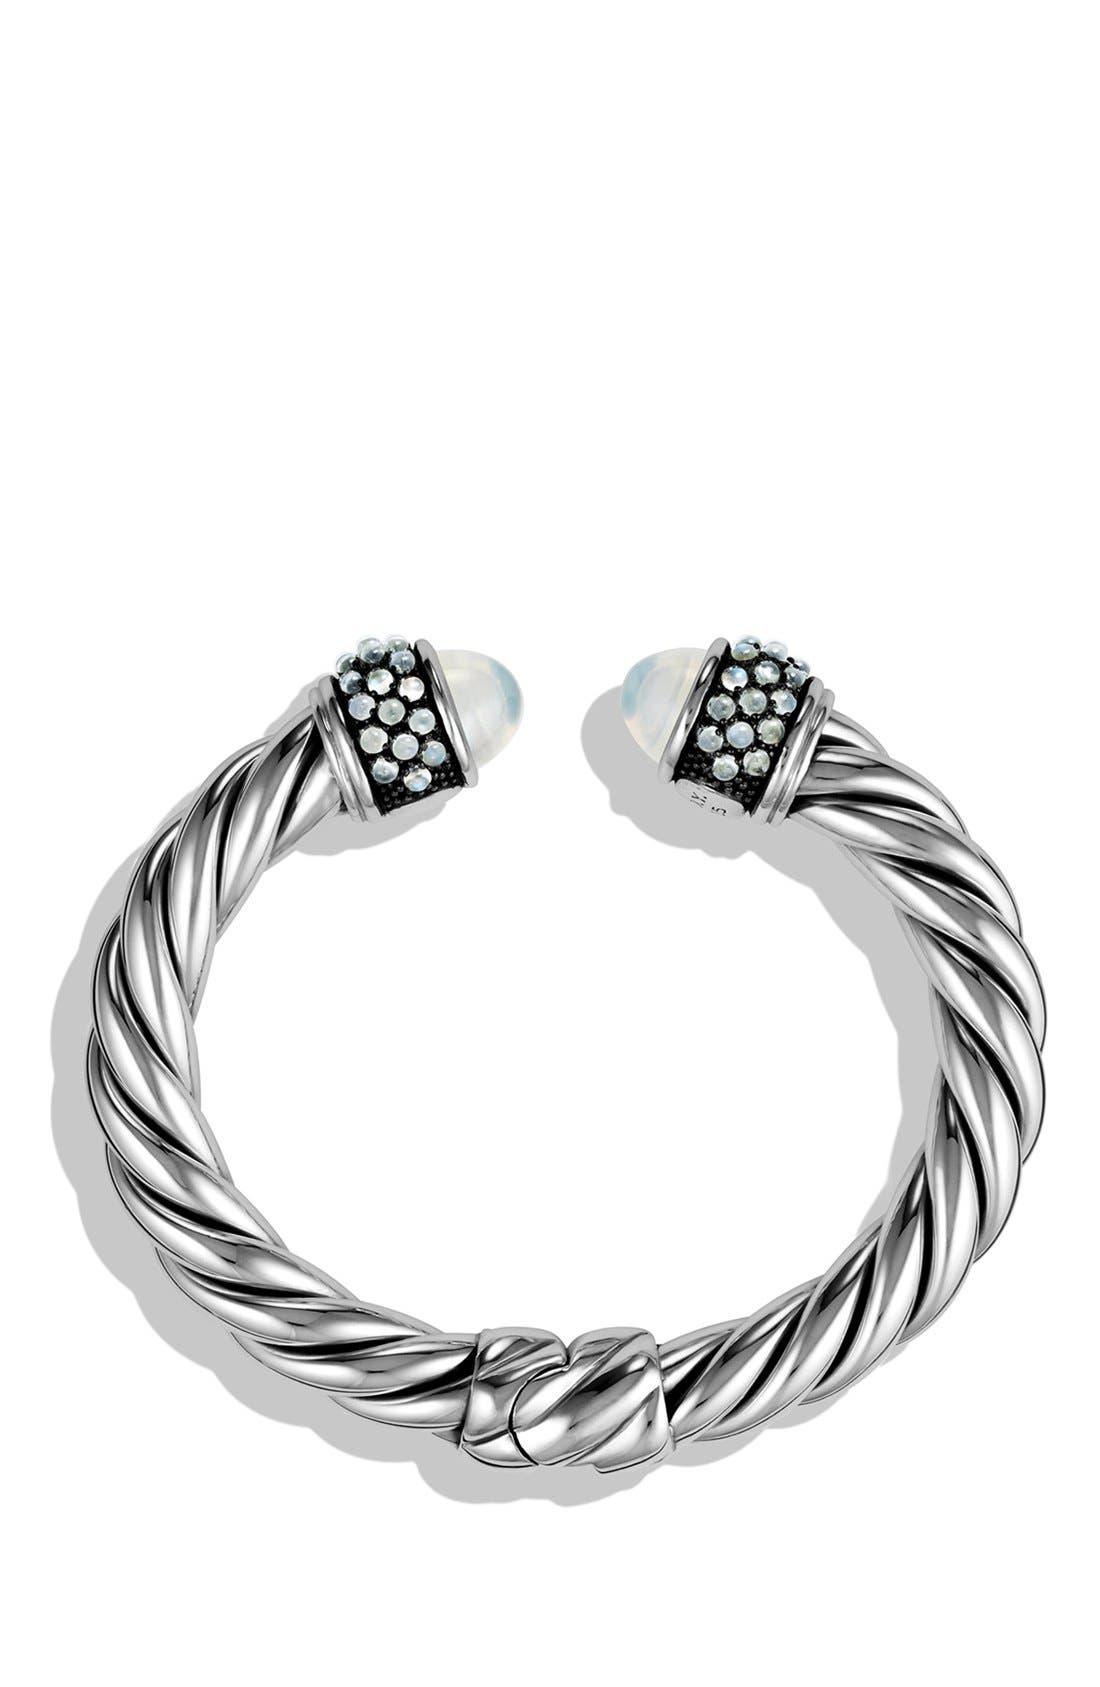 Bracelet with Semiprecious Stones, 10mm,                             Alternate thumbnail 2, color,                             MOON/ MILKY QUARTZ